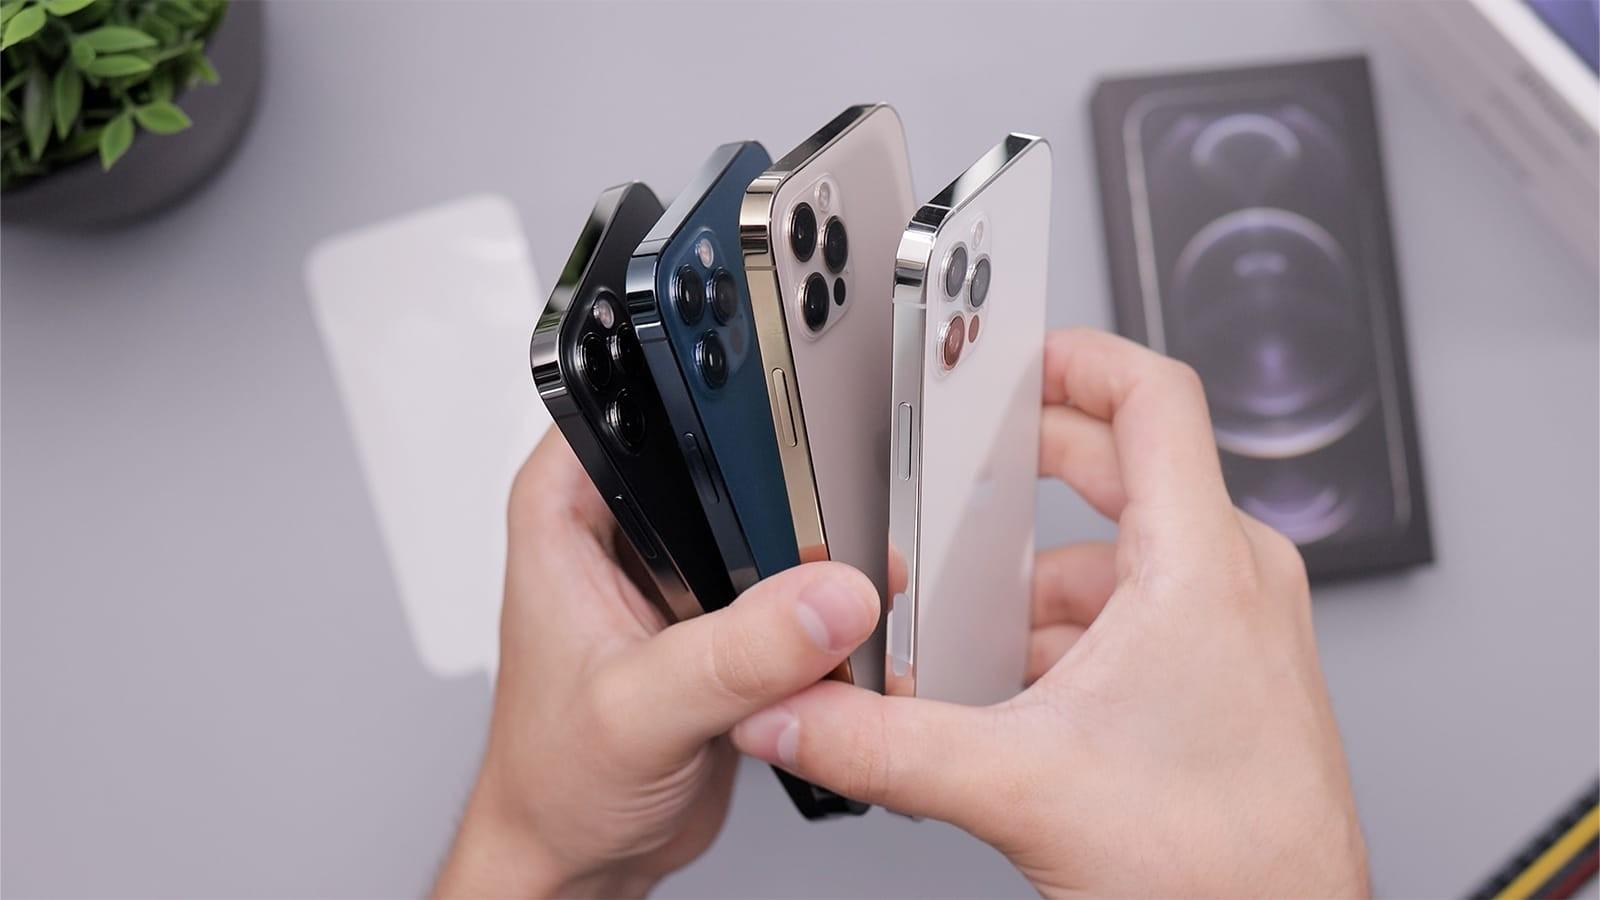 bo-tu-iphone-13-trinh-lang-voi-khong-nhieu-cai-tien-dot-pha-1-1631673352.jpeg